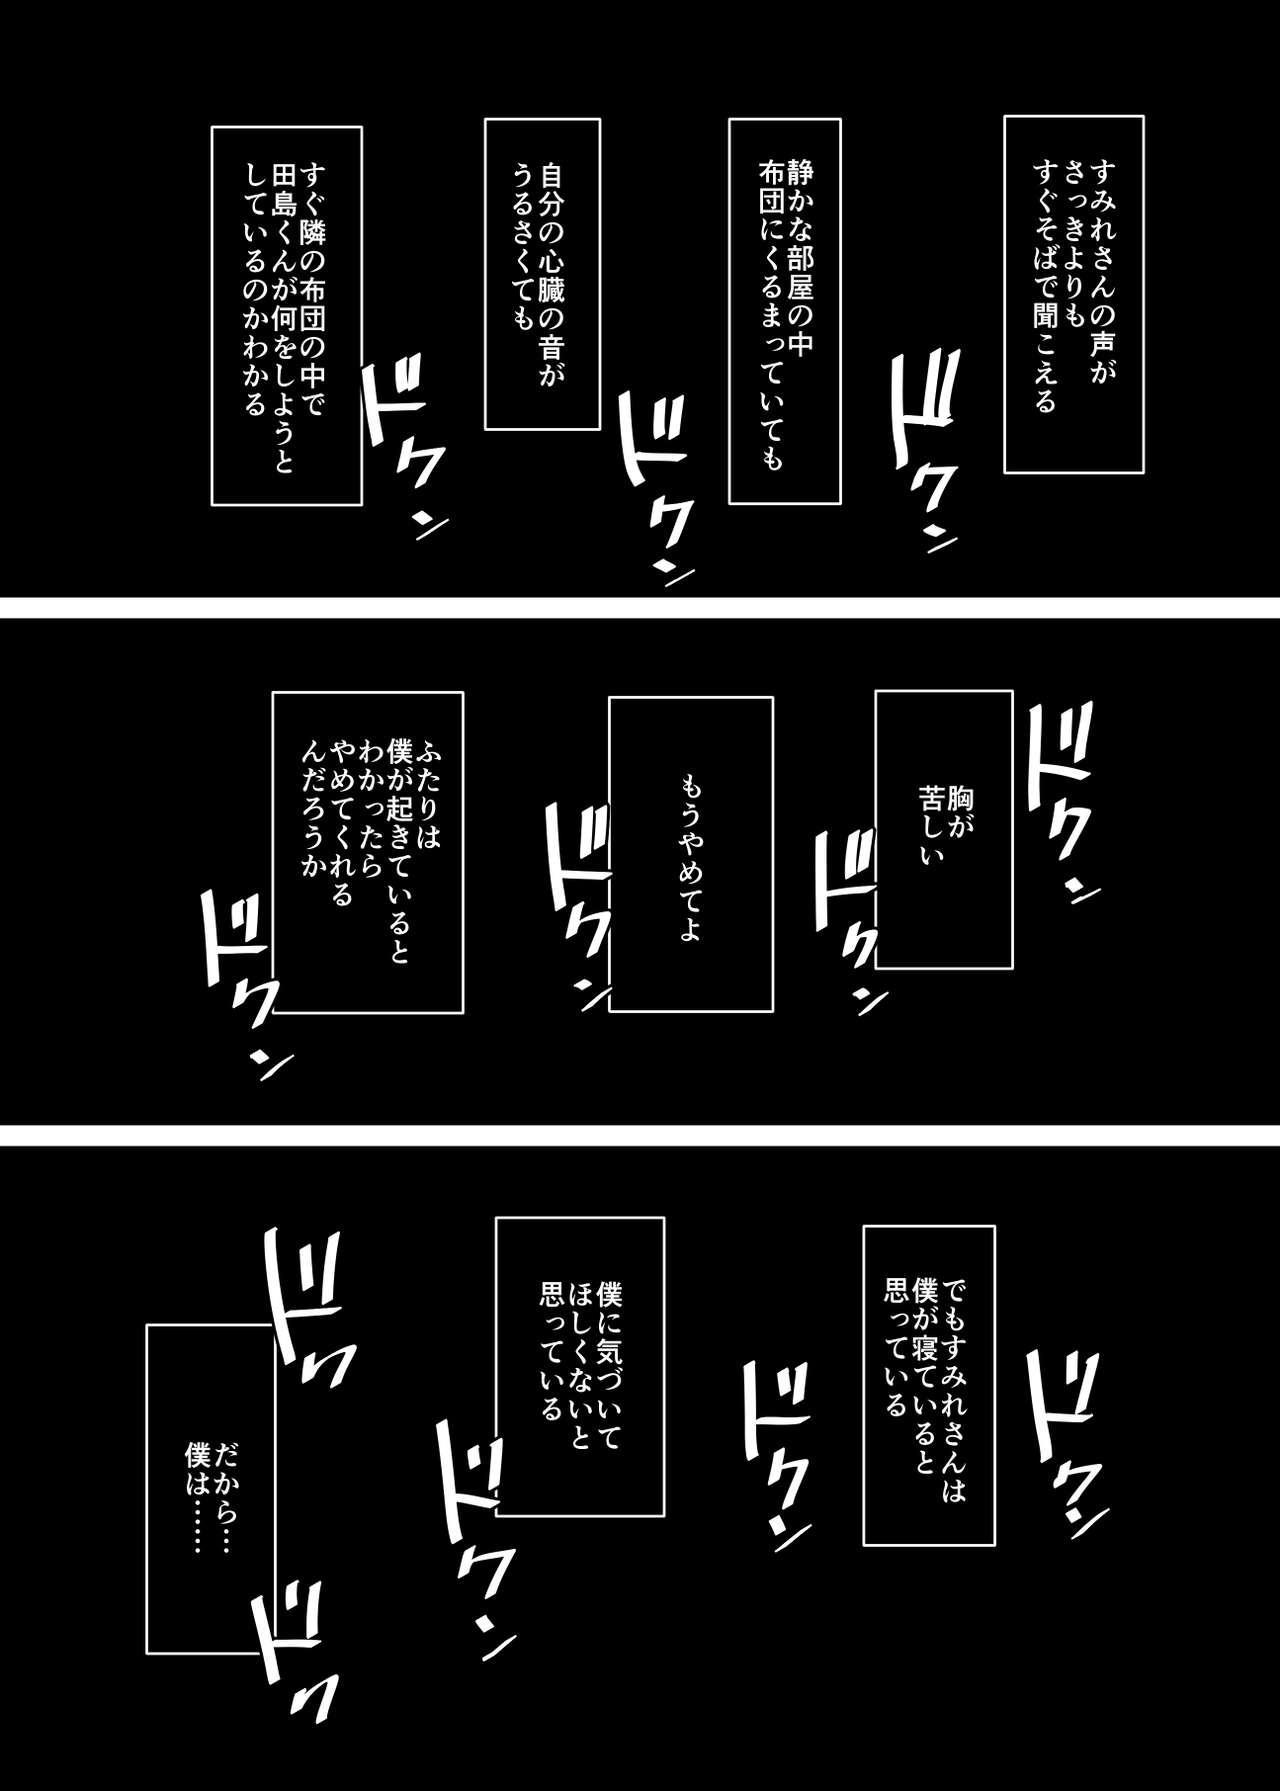 Hitozuma Kyoushi NTR Shuugakuryokou 43